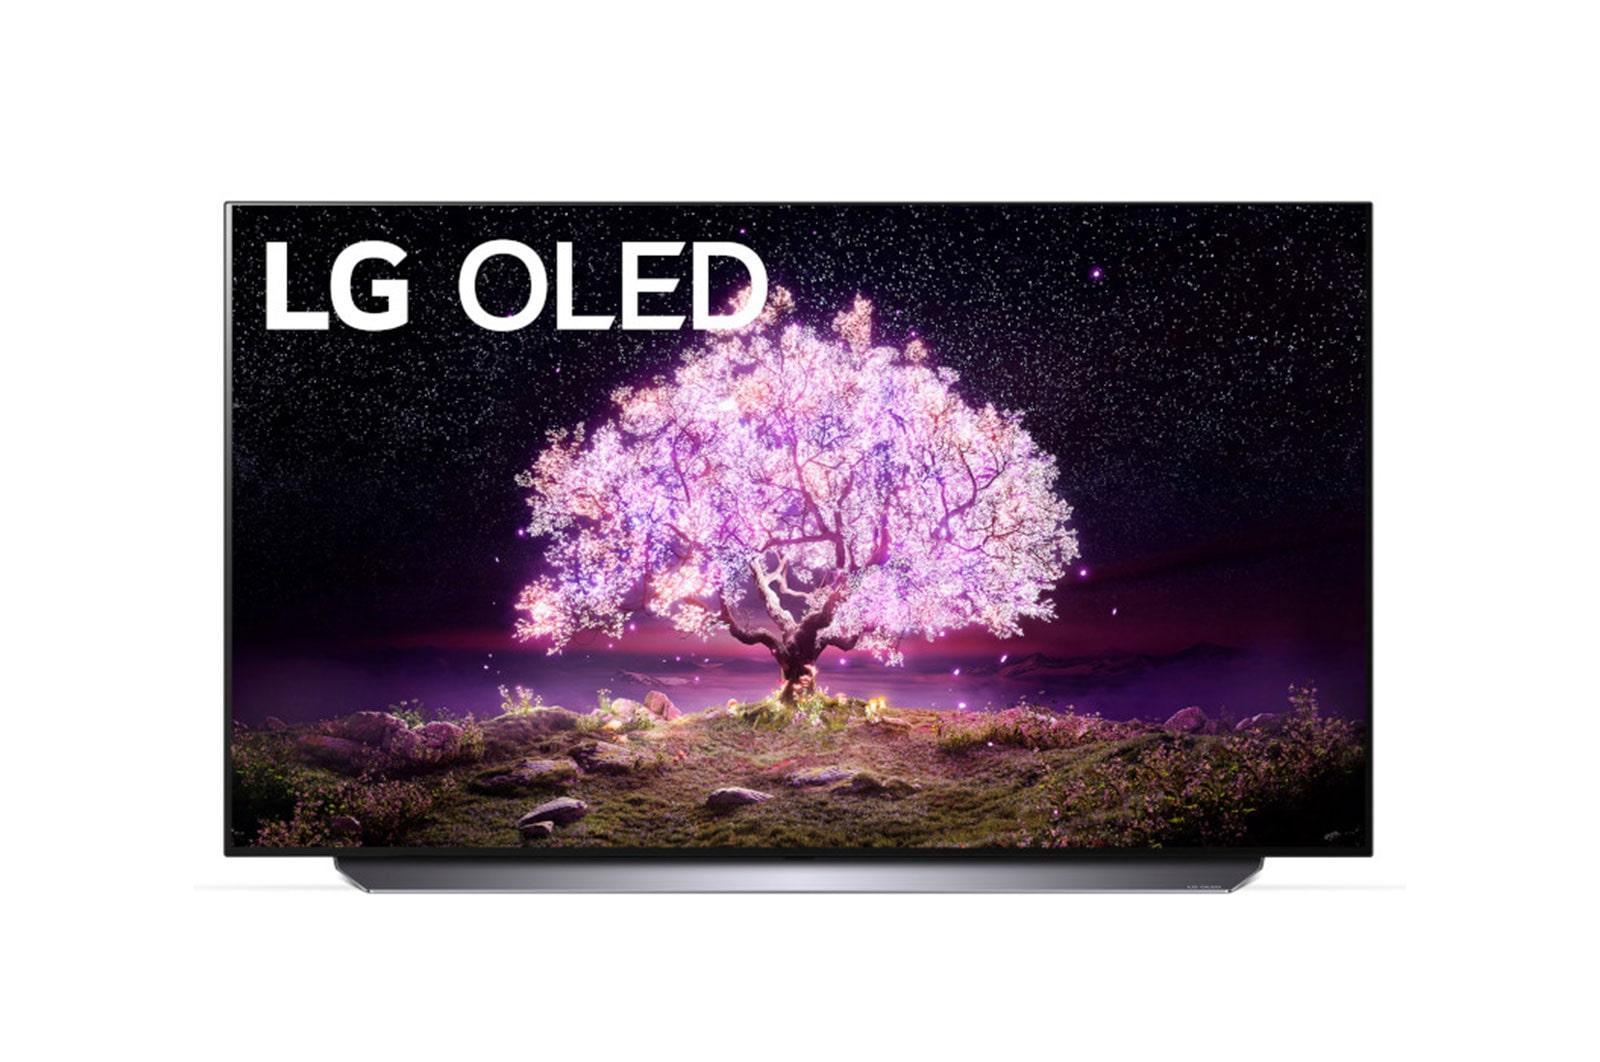 LG AppliancesLg C1 55 Inch Class 4k Smart Oled Tv W/ Ai Thinq® (54.6'' Diag)